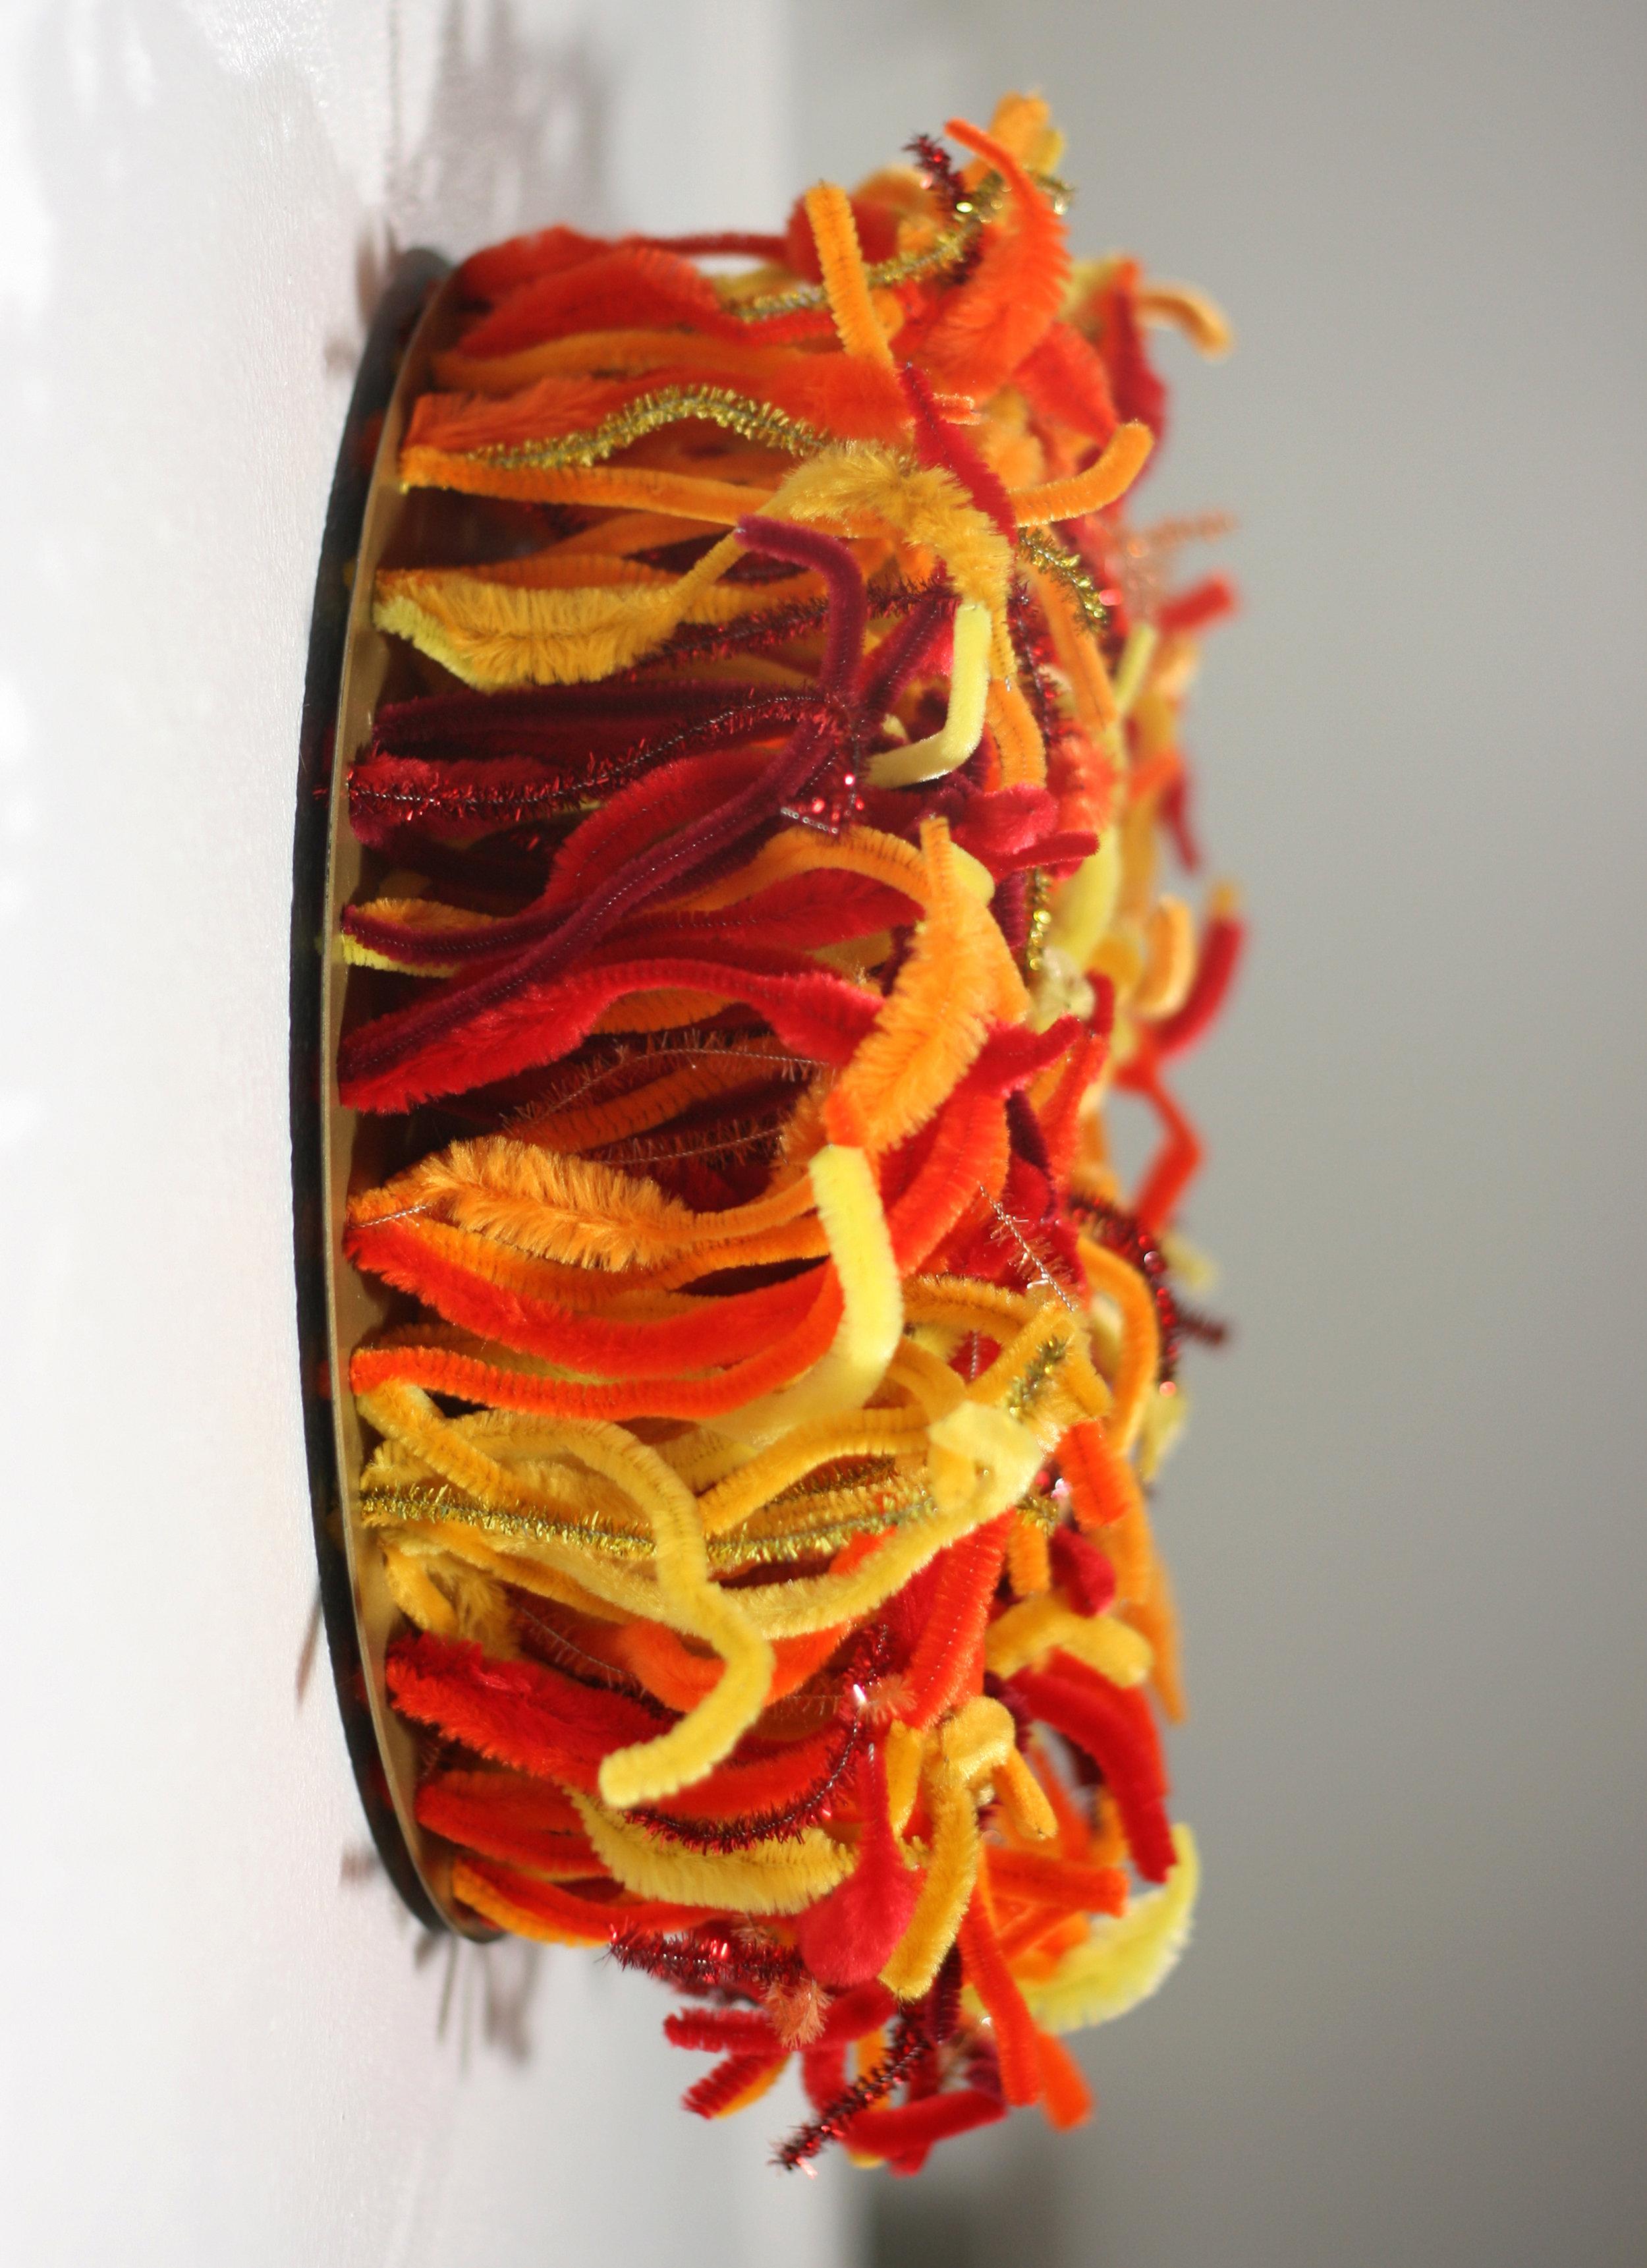 Fire Ball - direct side view - Hallie Rae Ward - Austin Art - Austin Gifts.jpg